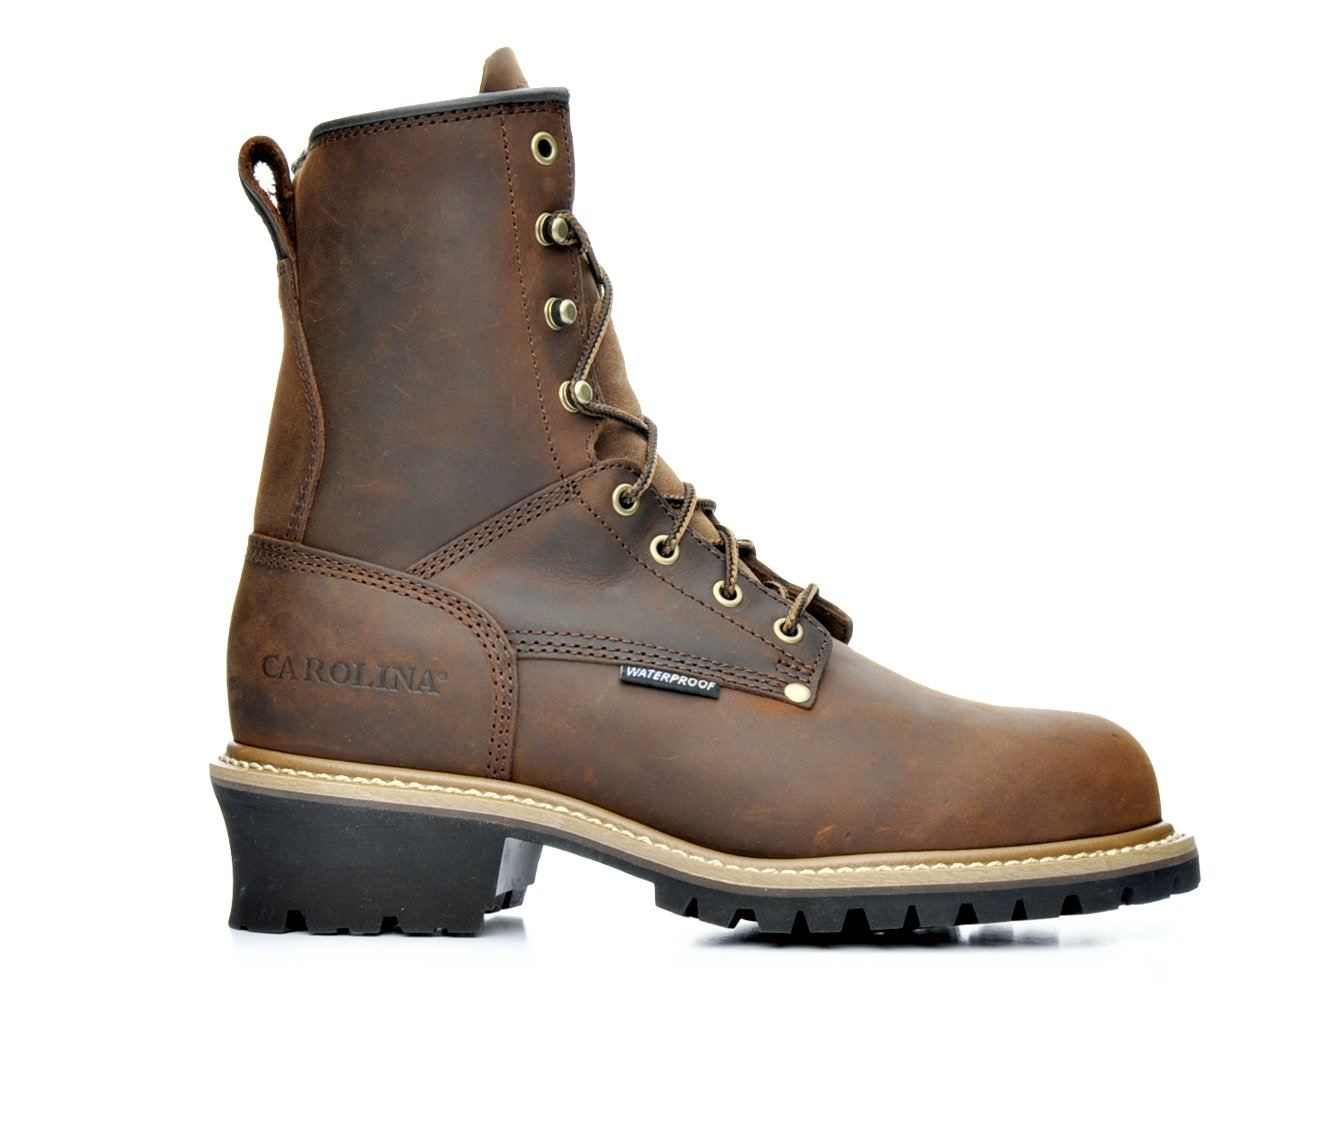 Carolina Boots CA9821 8 In Steel Toe Waterproof Men's Boots (Brown Leather)